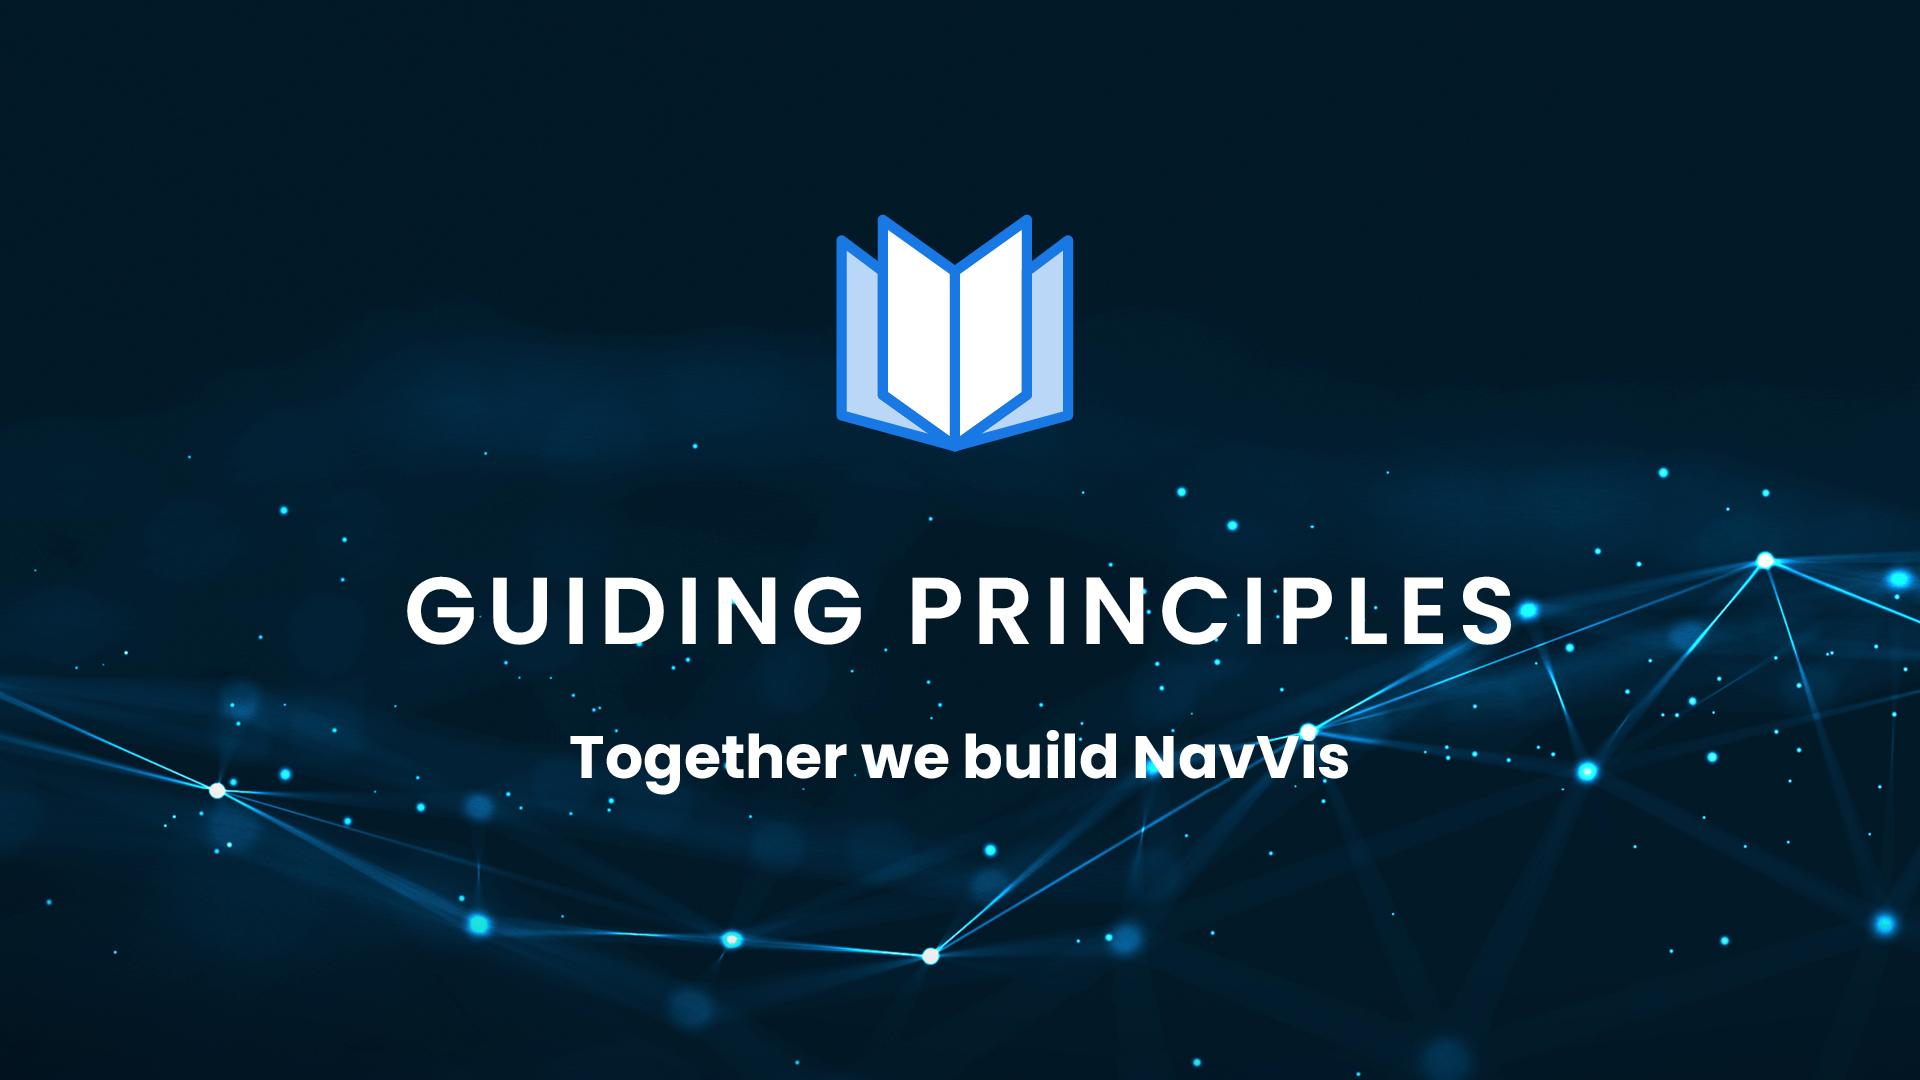 Guiding principles: Together we build NavVis